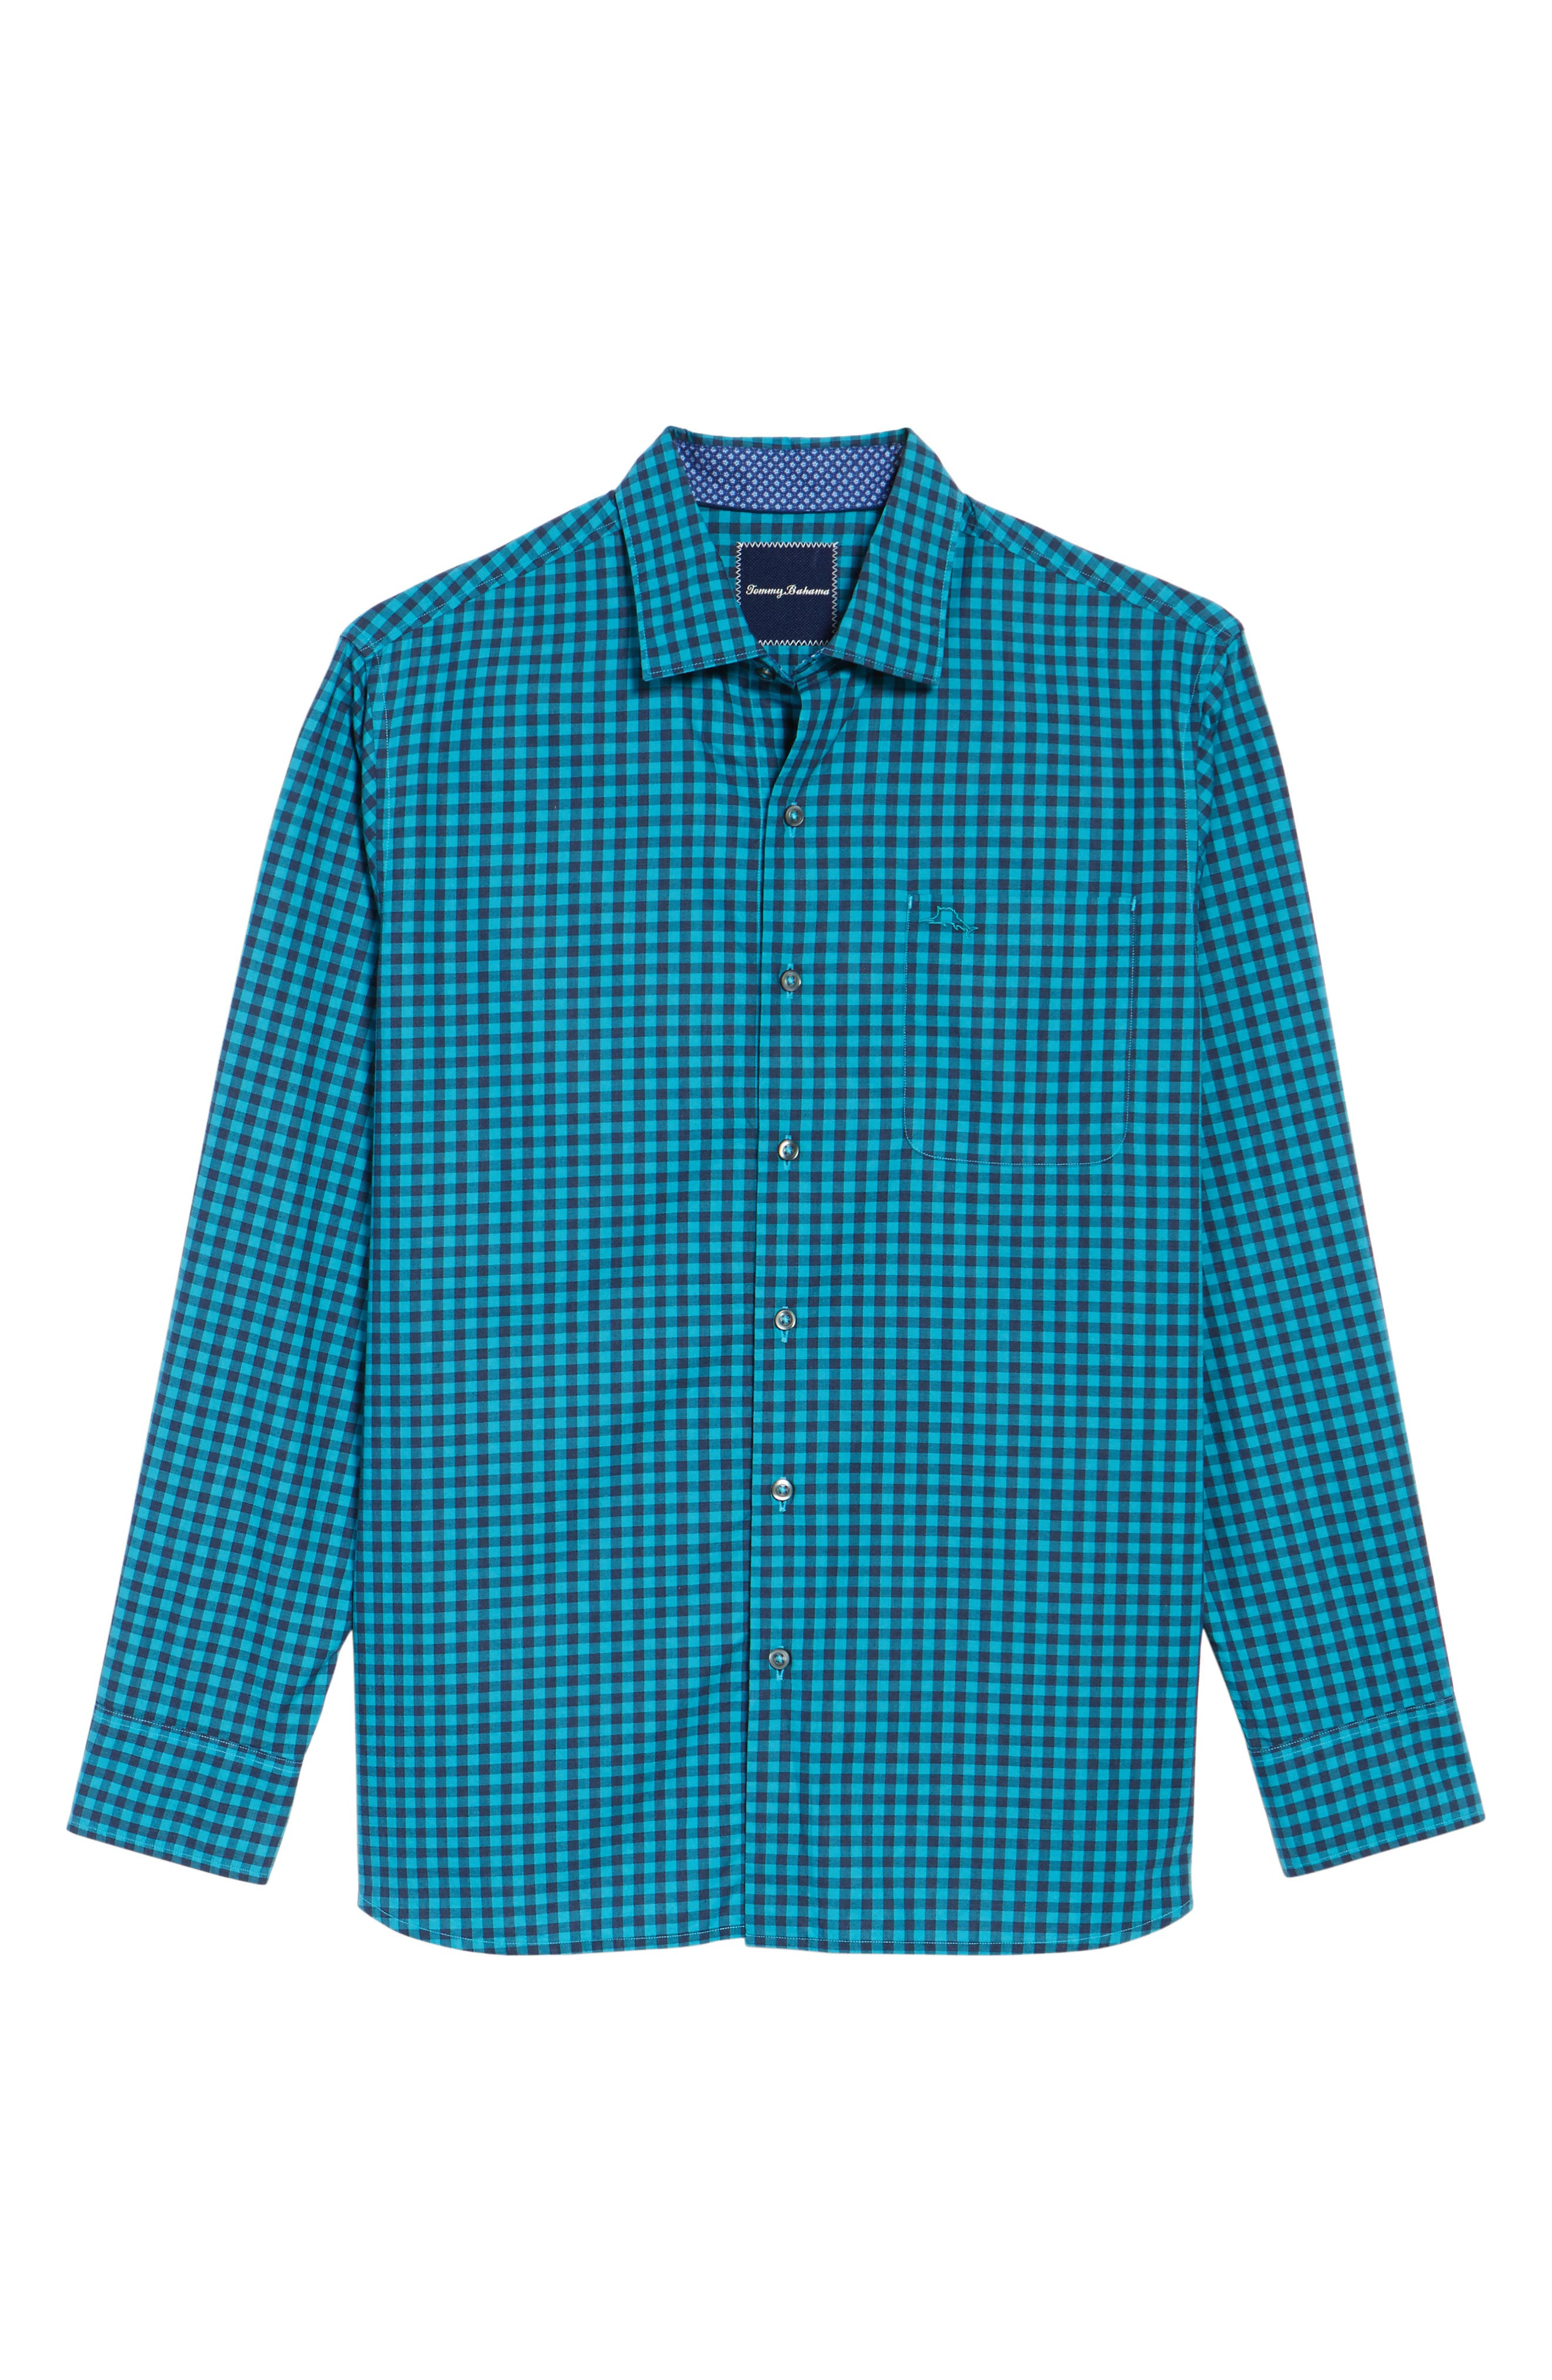 Mazagan Check Sport Shirt,                             Alternate thumbnail 6, color,                             Riviera Azure